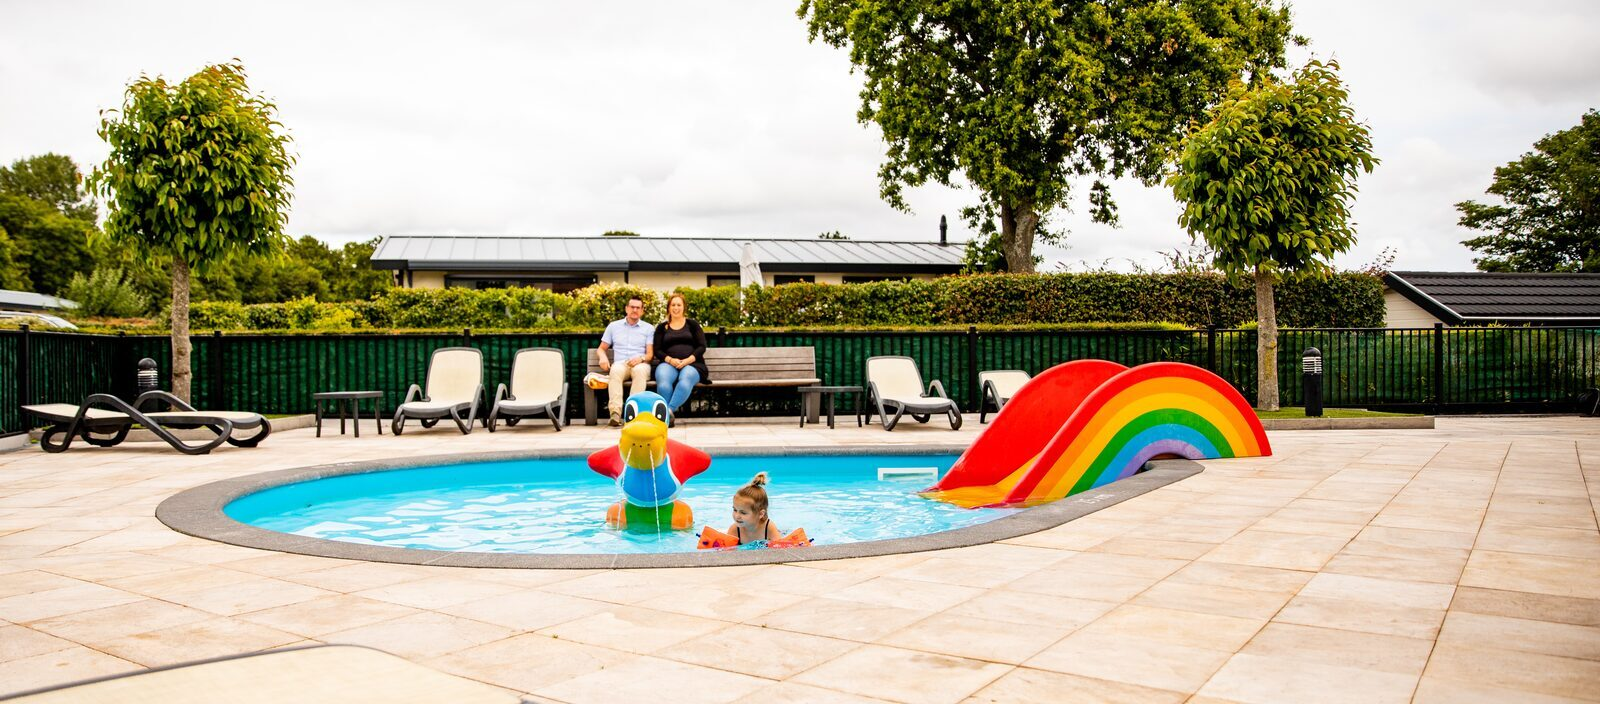 Toddler/children's pool